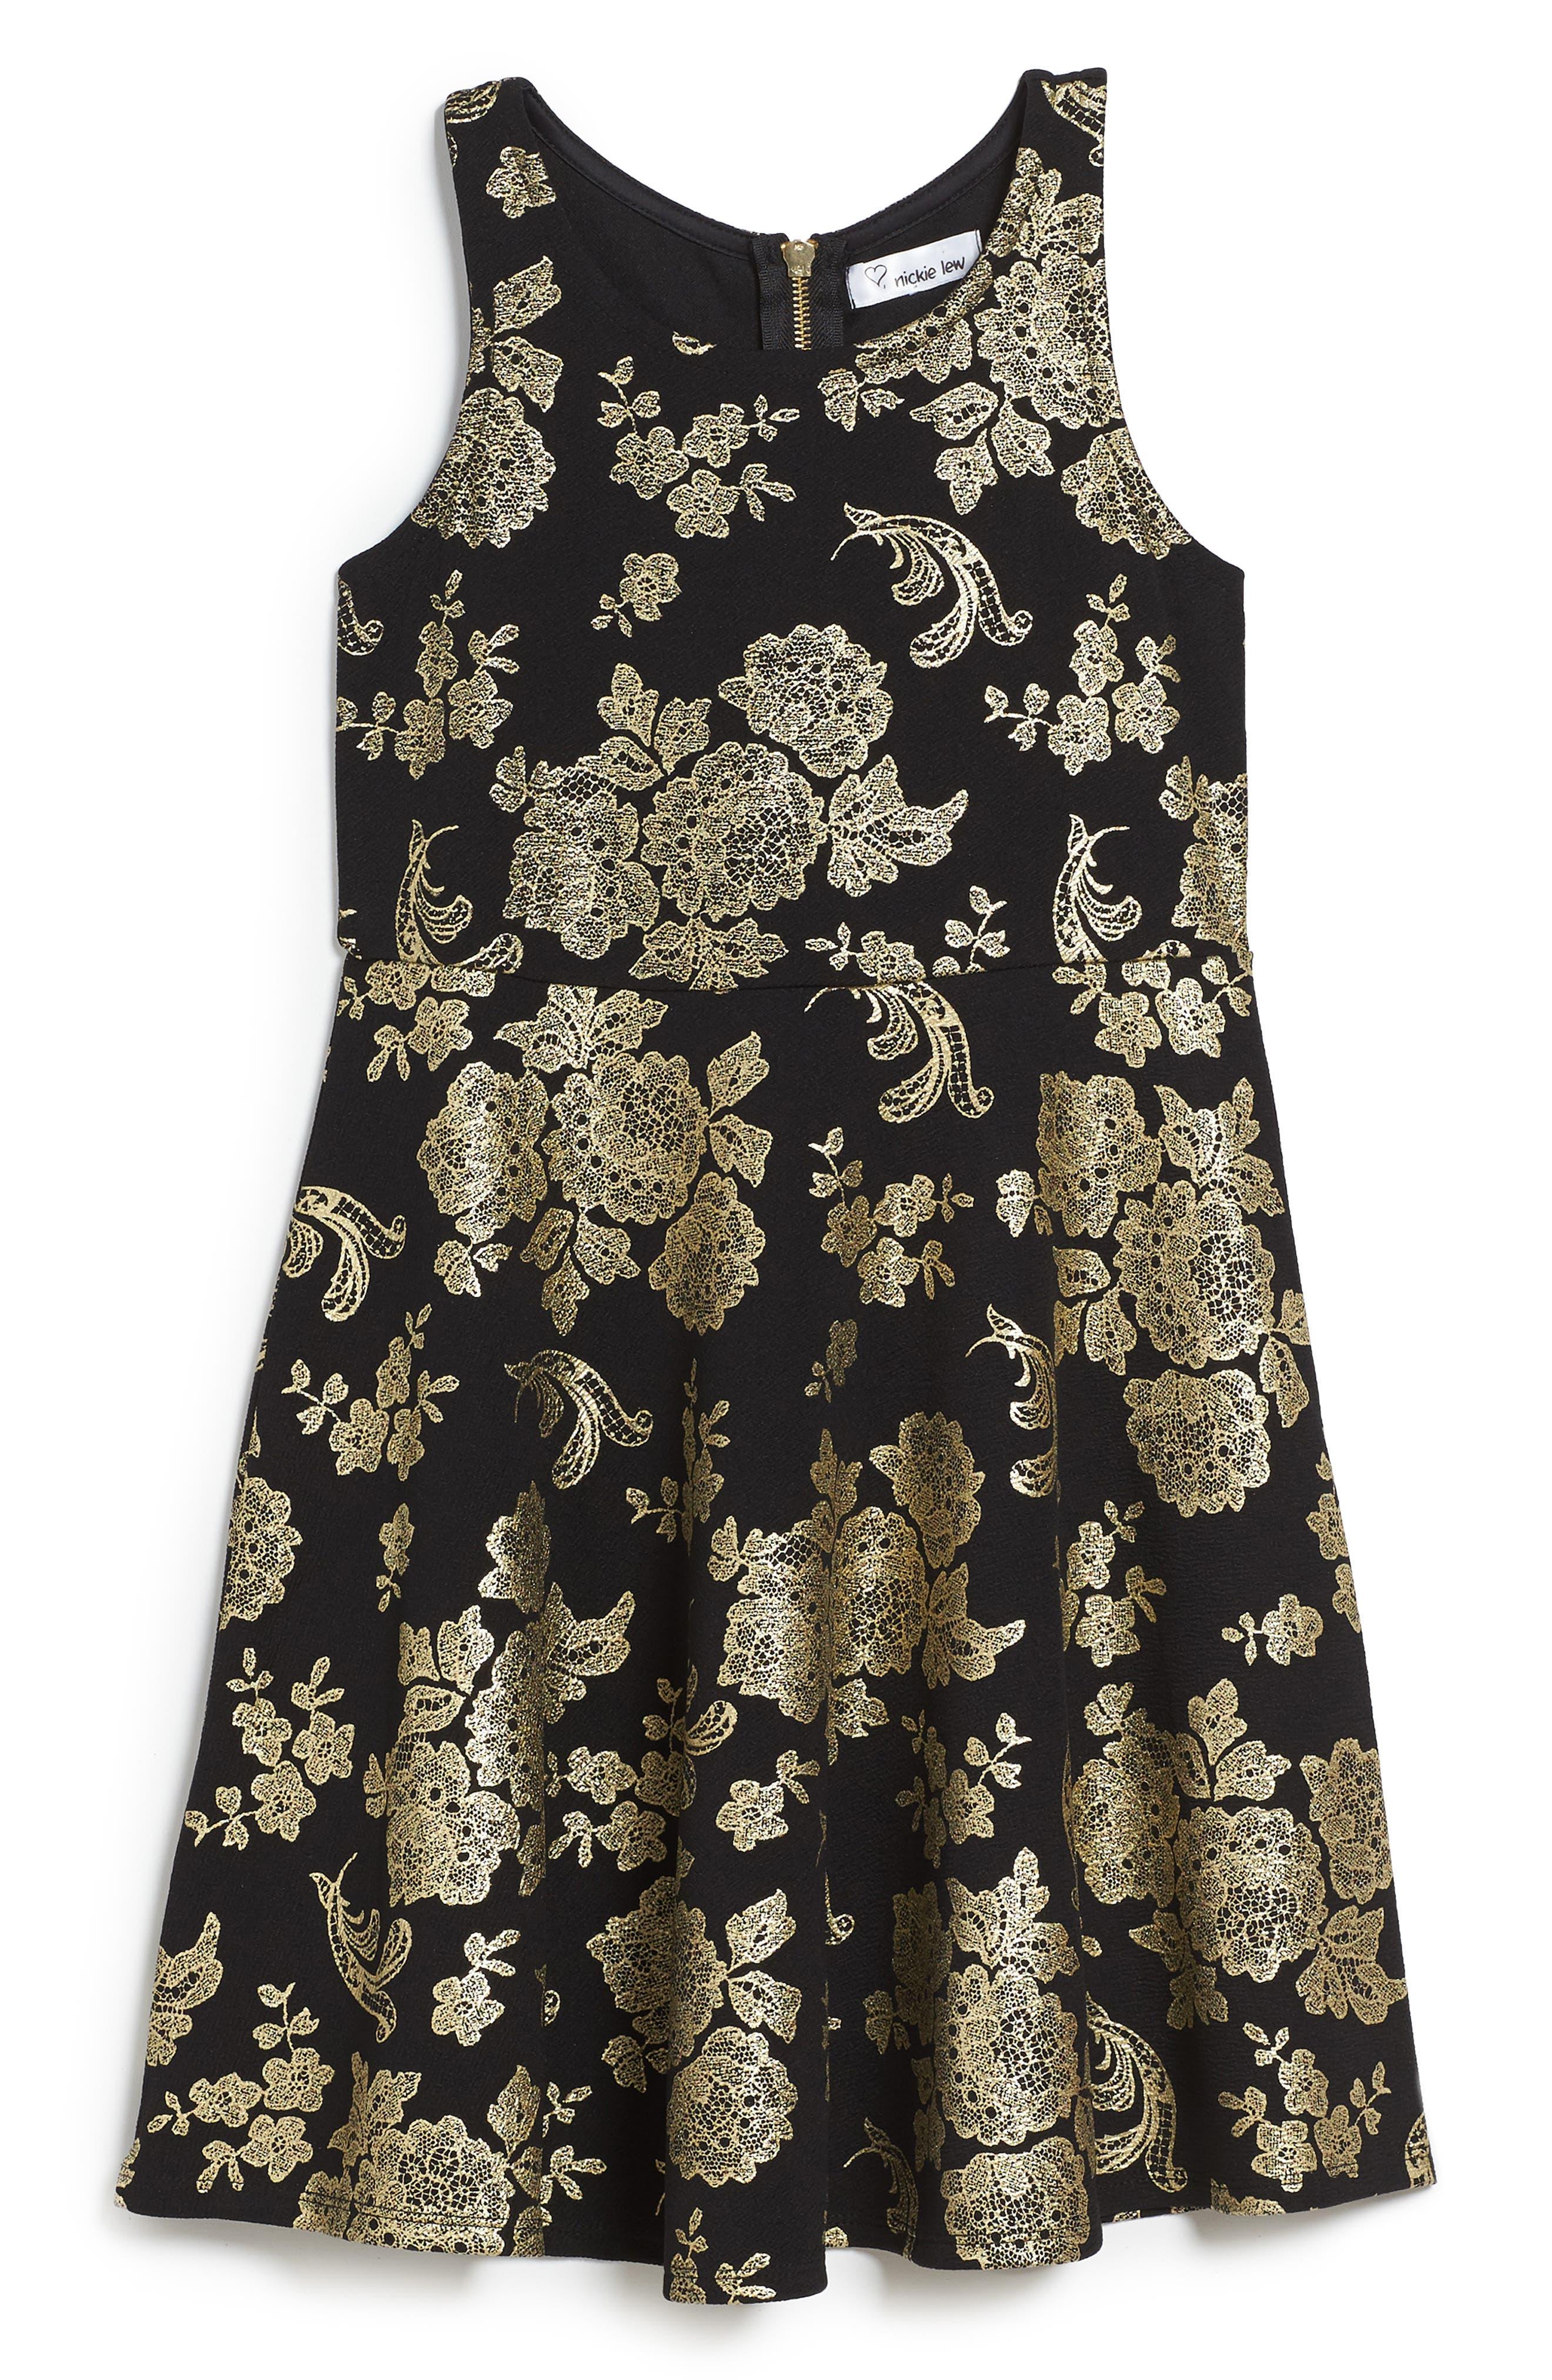 Alternate Image 1 Selected - Love, Nickie Lew Foil Print Skater Dress (Big Girls)